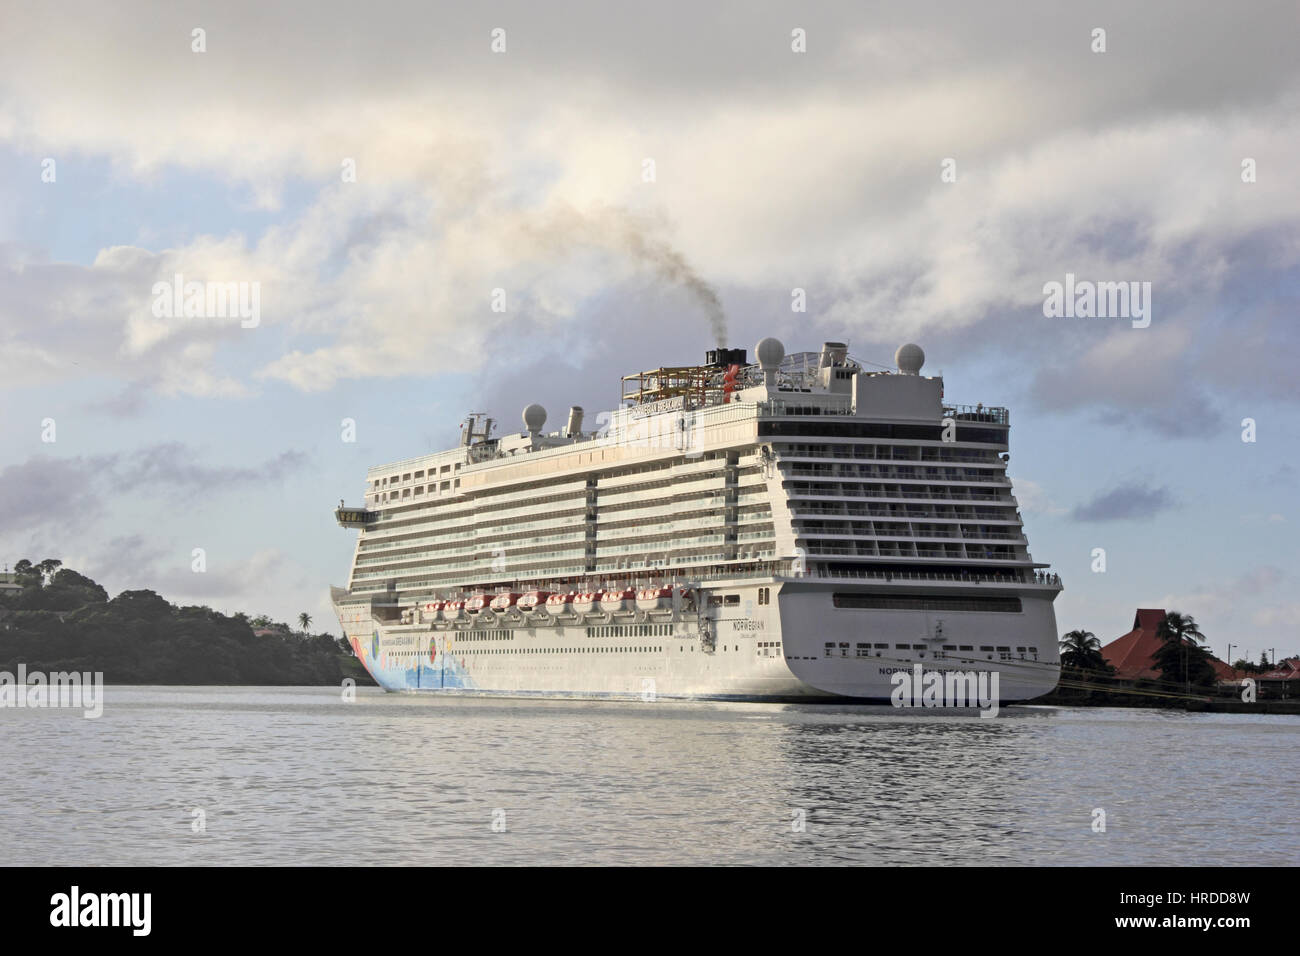 Norwegian Cruise Line ship Norwegian Breakaway, moored in harbour, Castries, St Lucia - Stock Image